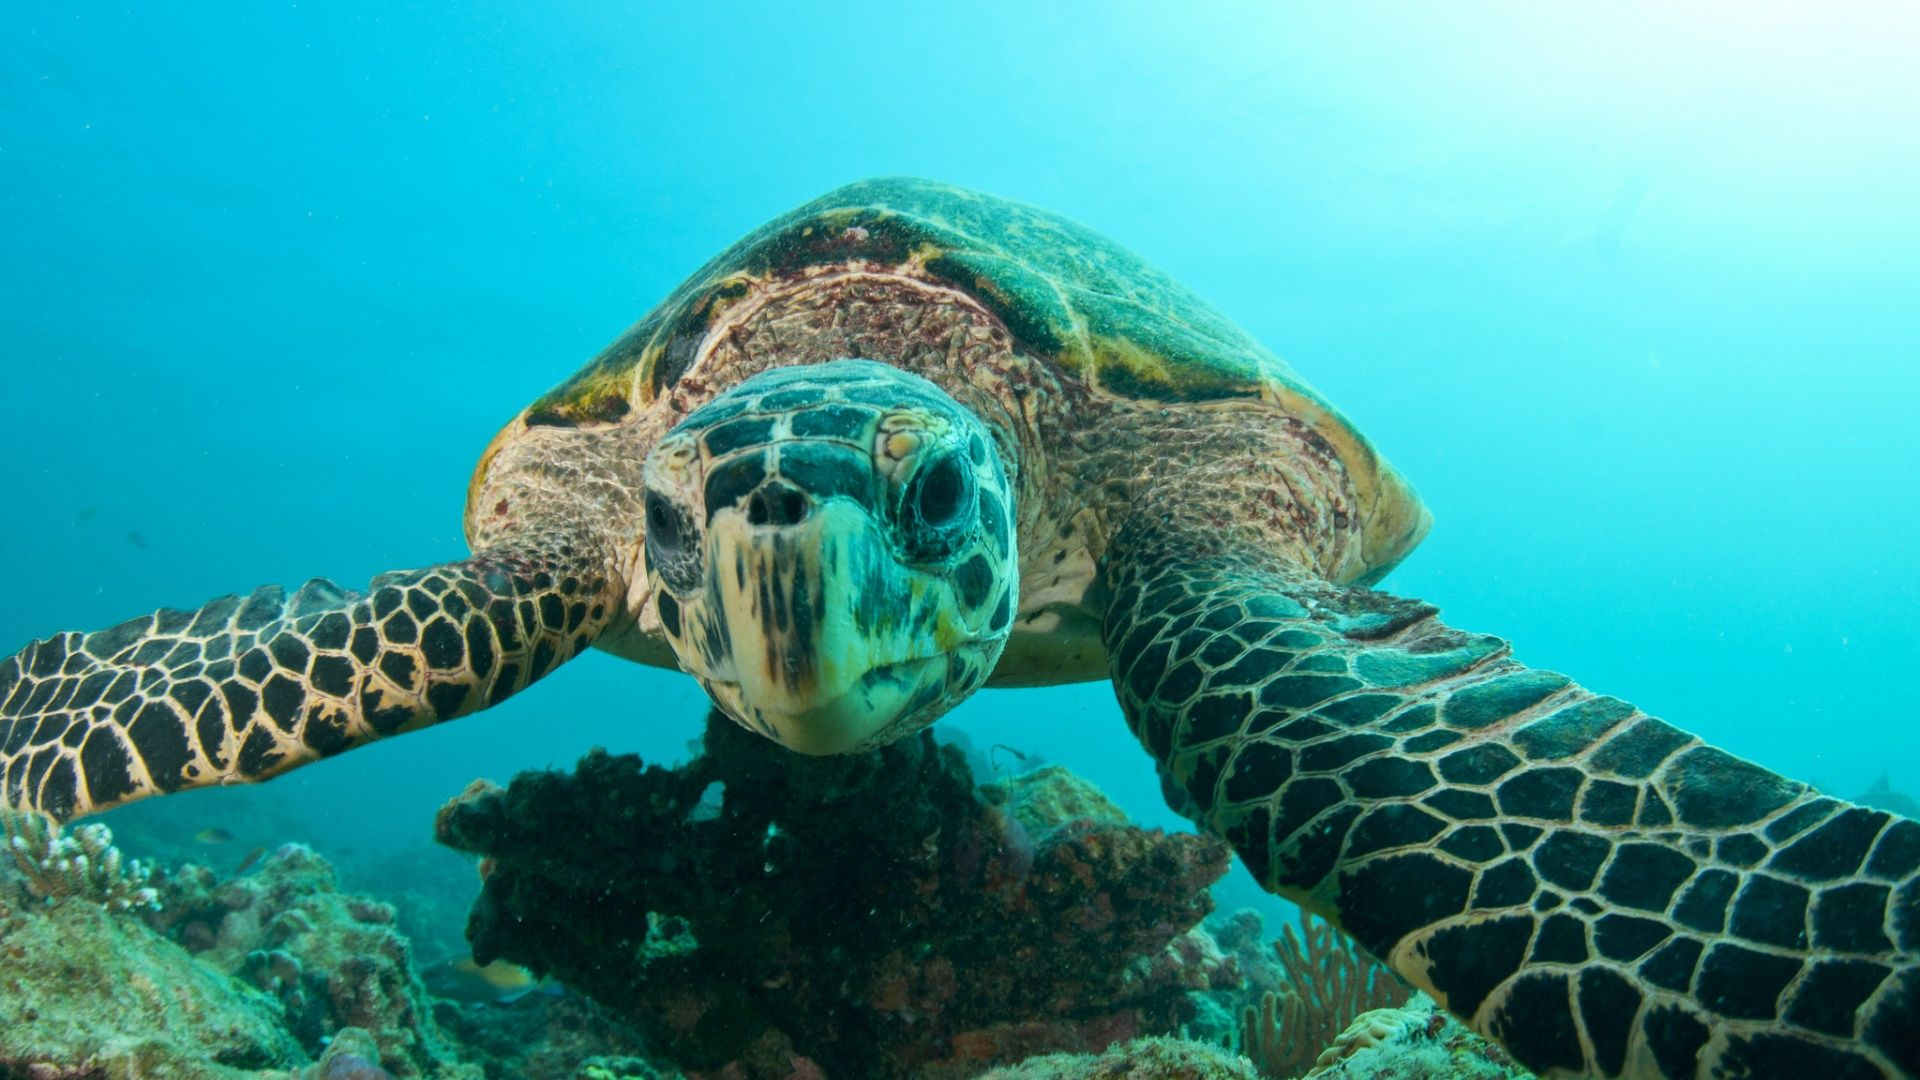 The Underwater World Of Turtles